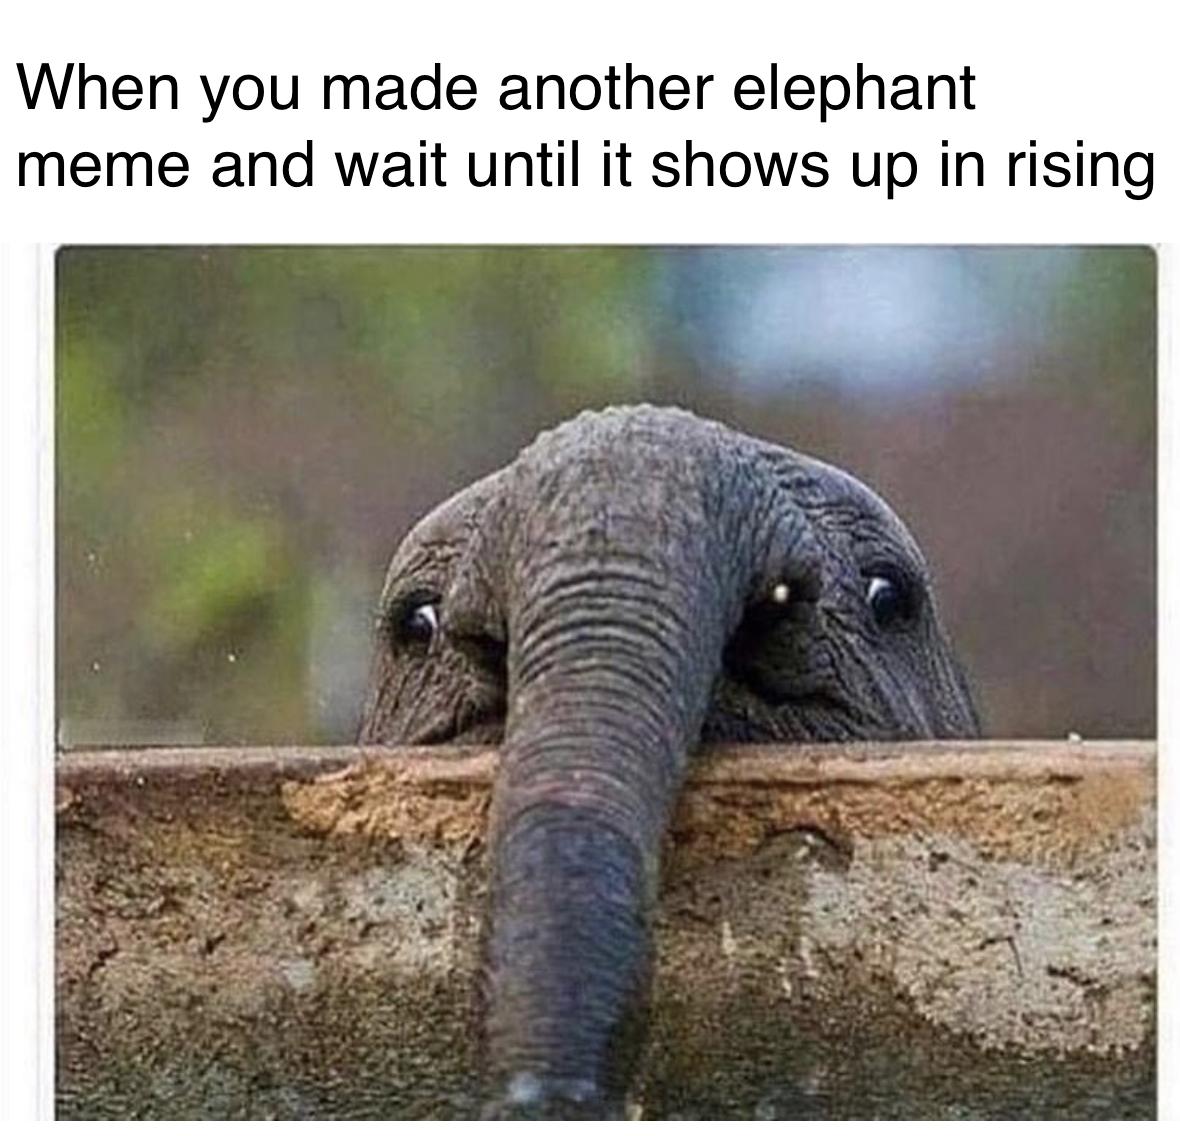 I'm stuck with them elephant tiddies